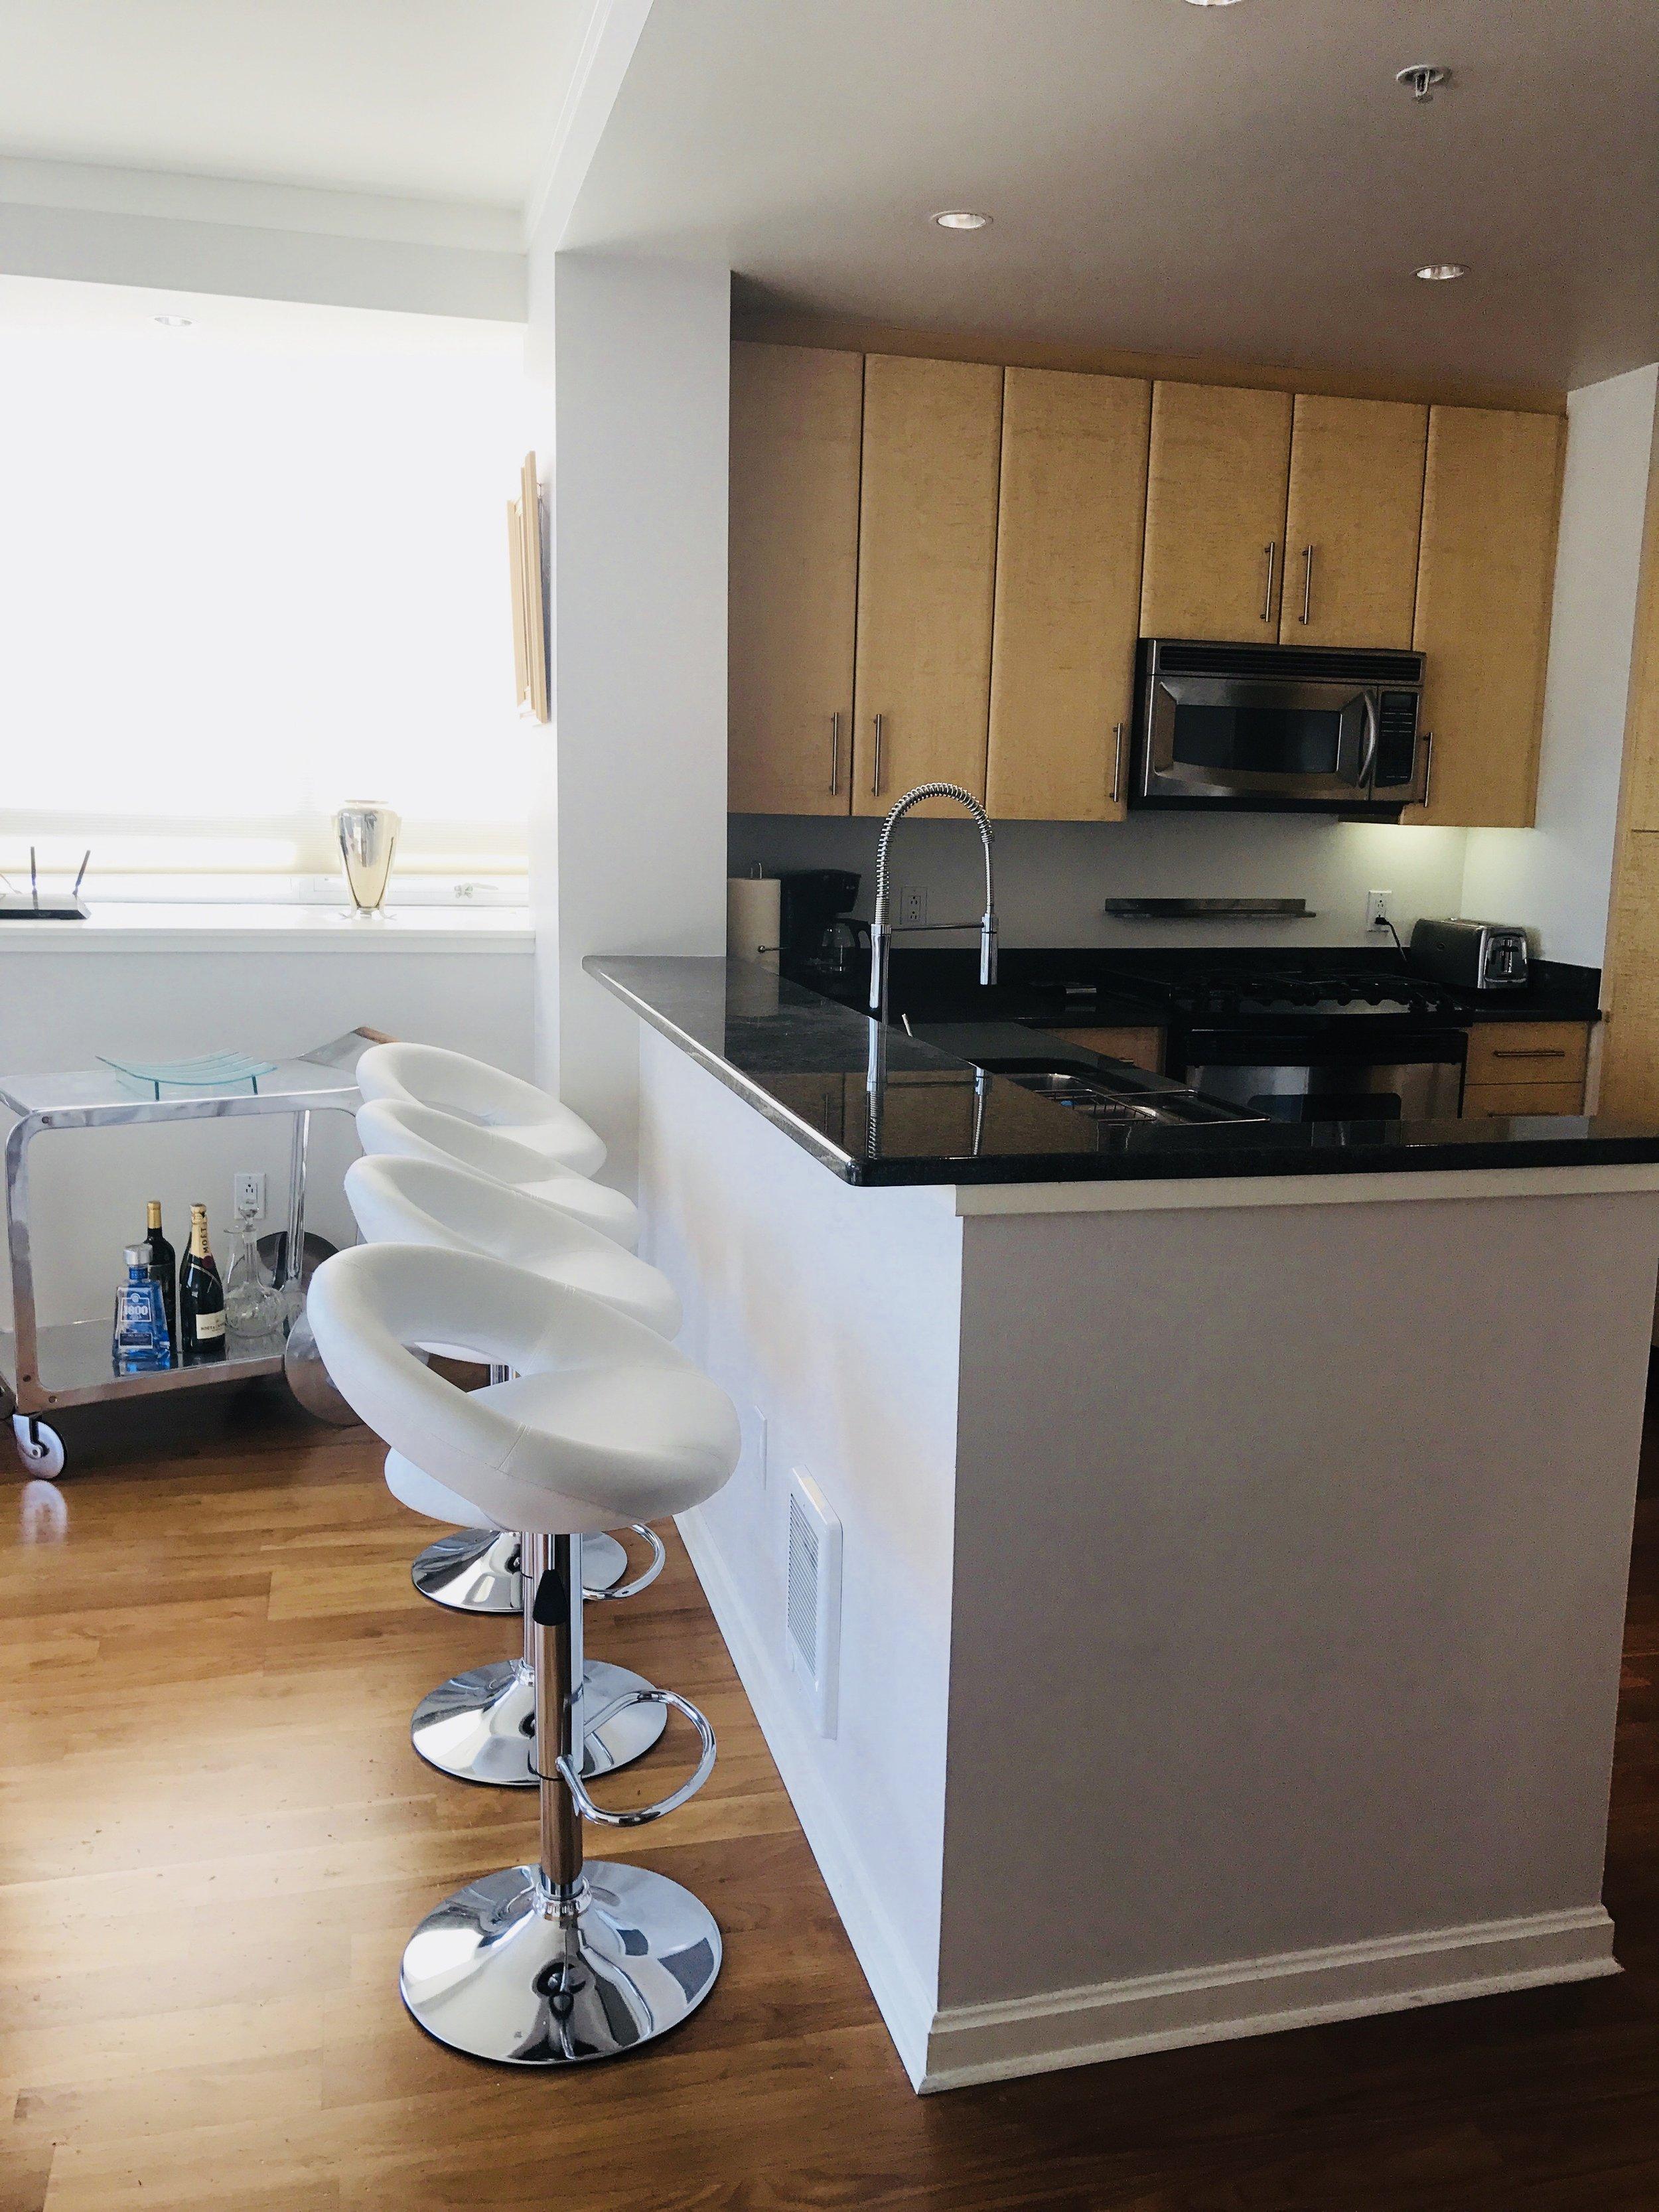 san francisco luxury apartments for rent.jpeg